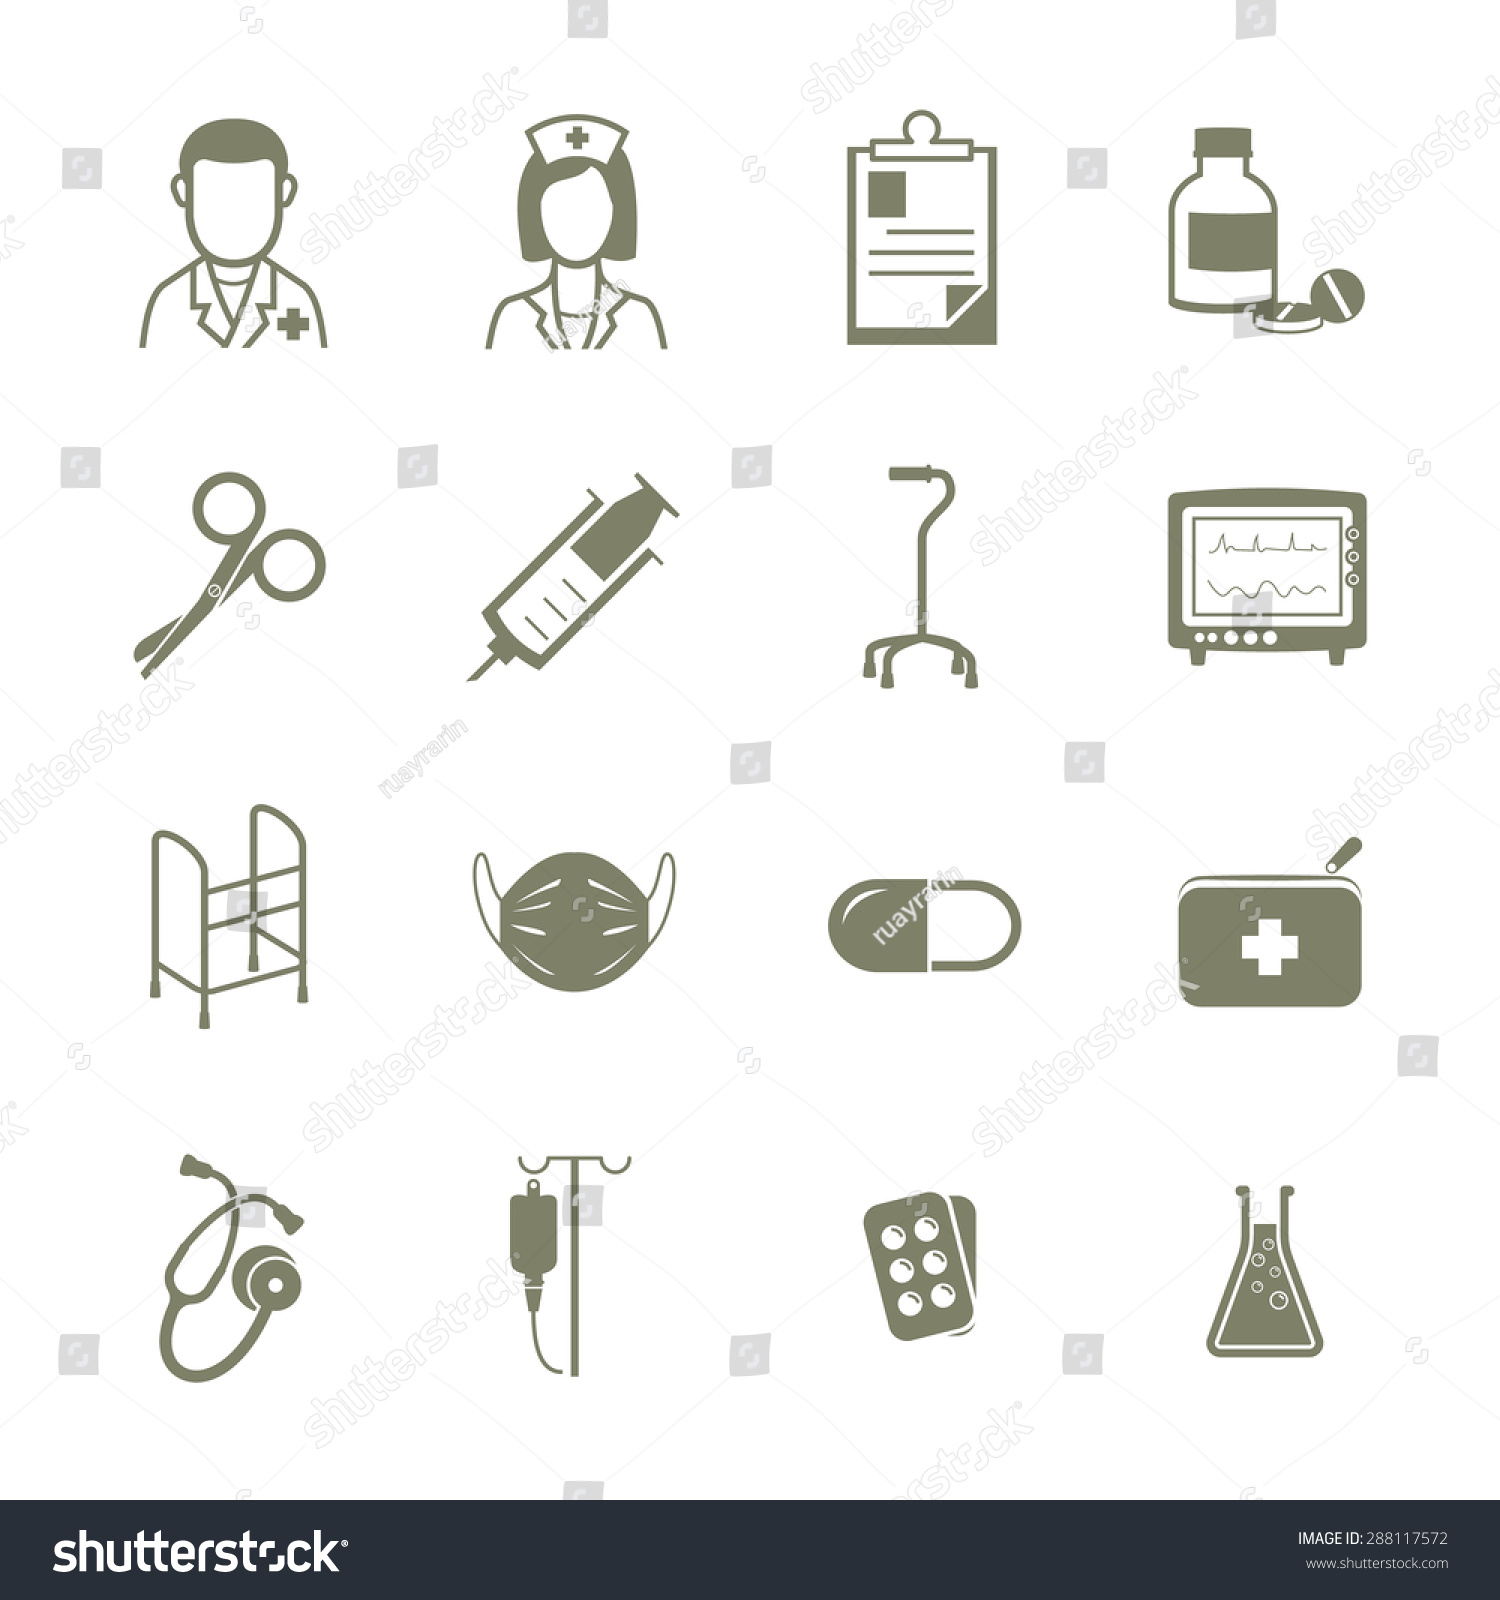 Hospital medical equipment icons vector sign stock vector 288117572 hospital medical equipment icons vector sign symbol biocorpaavc Choice Image